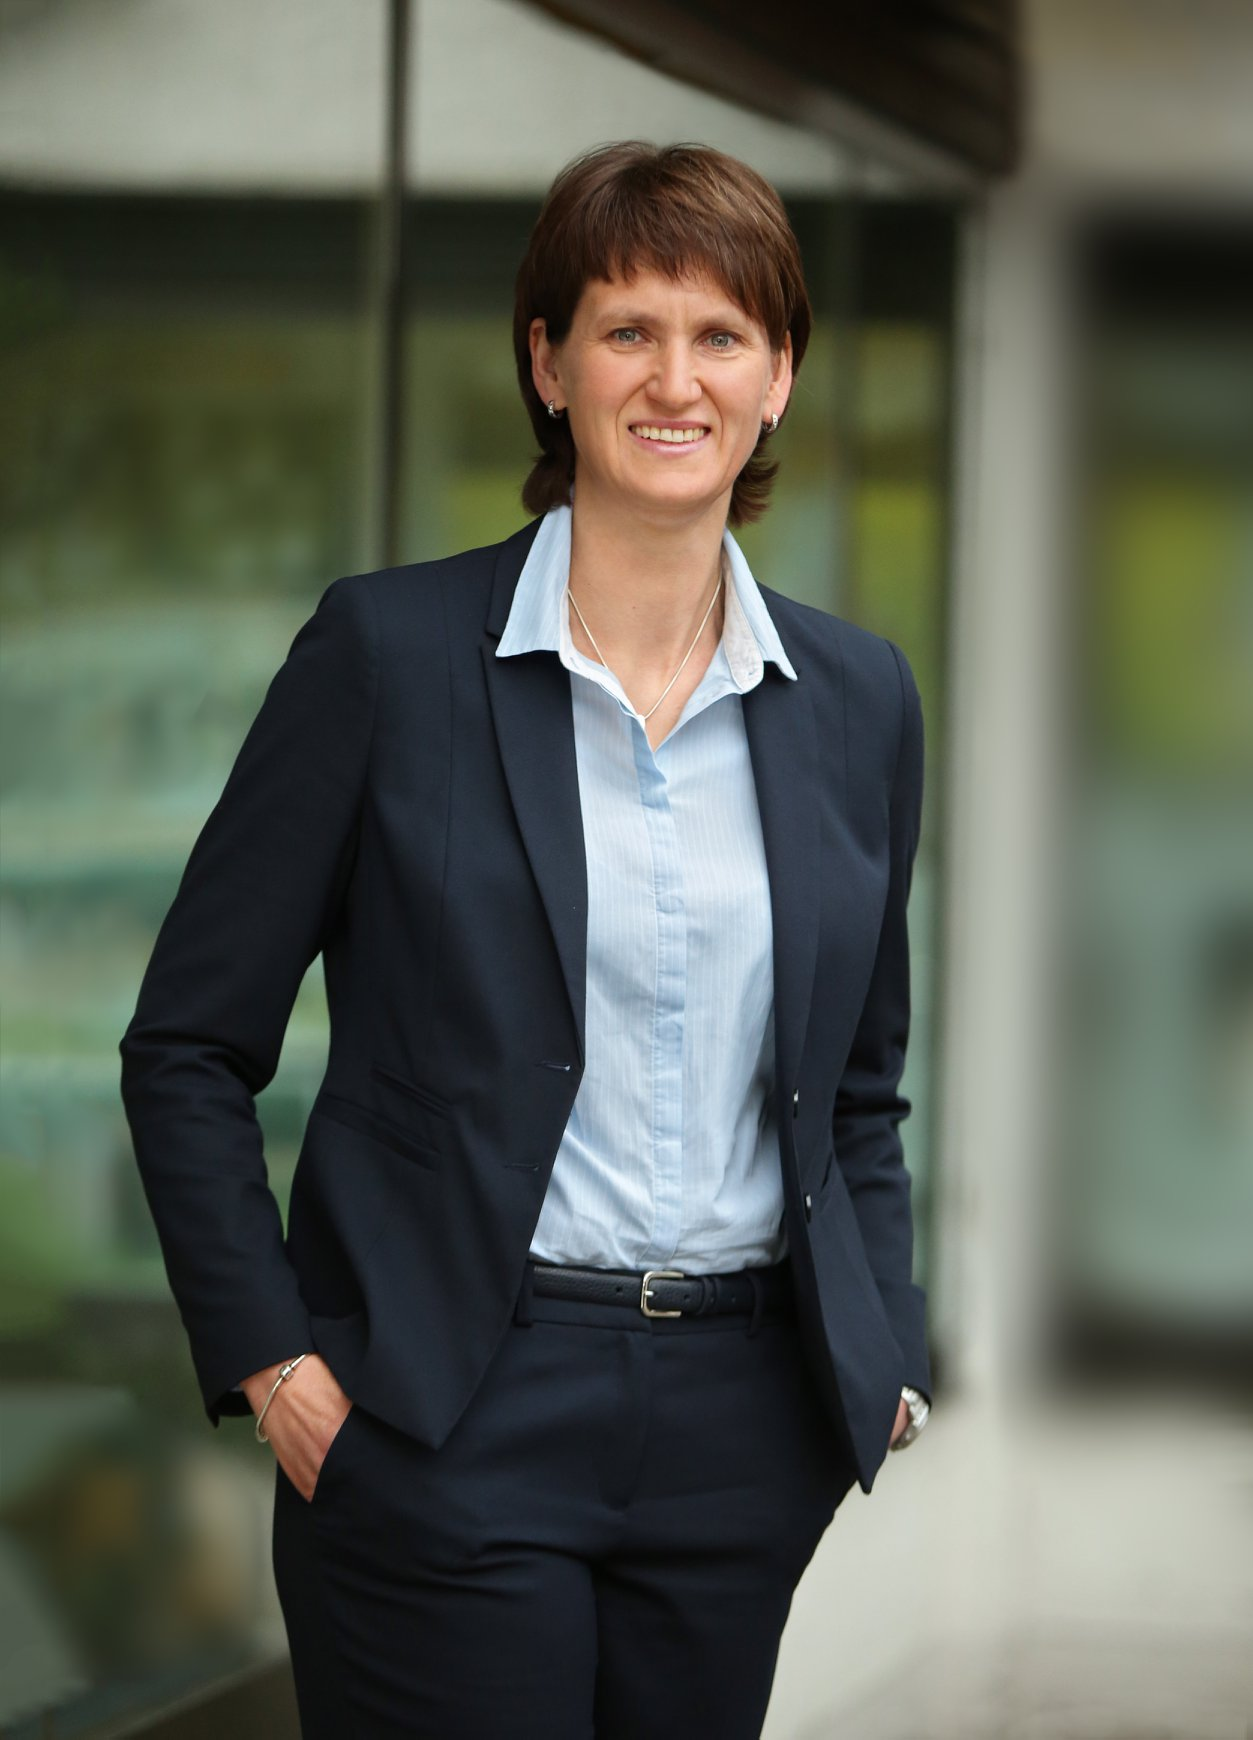 Irmgard Hibler Bürgermeisterkandidatin Isen